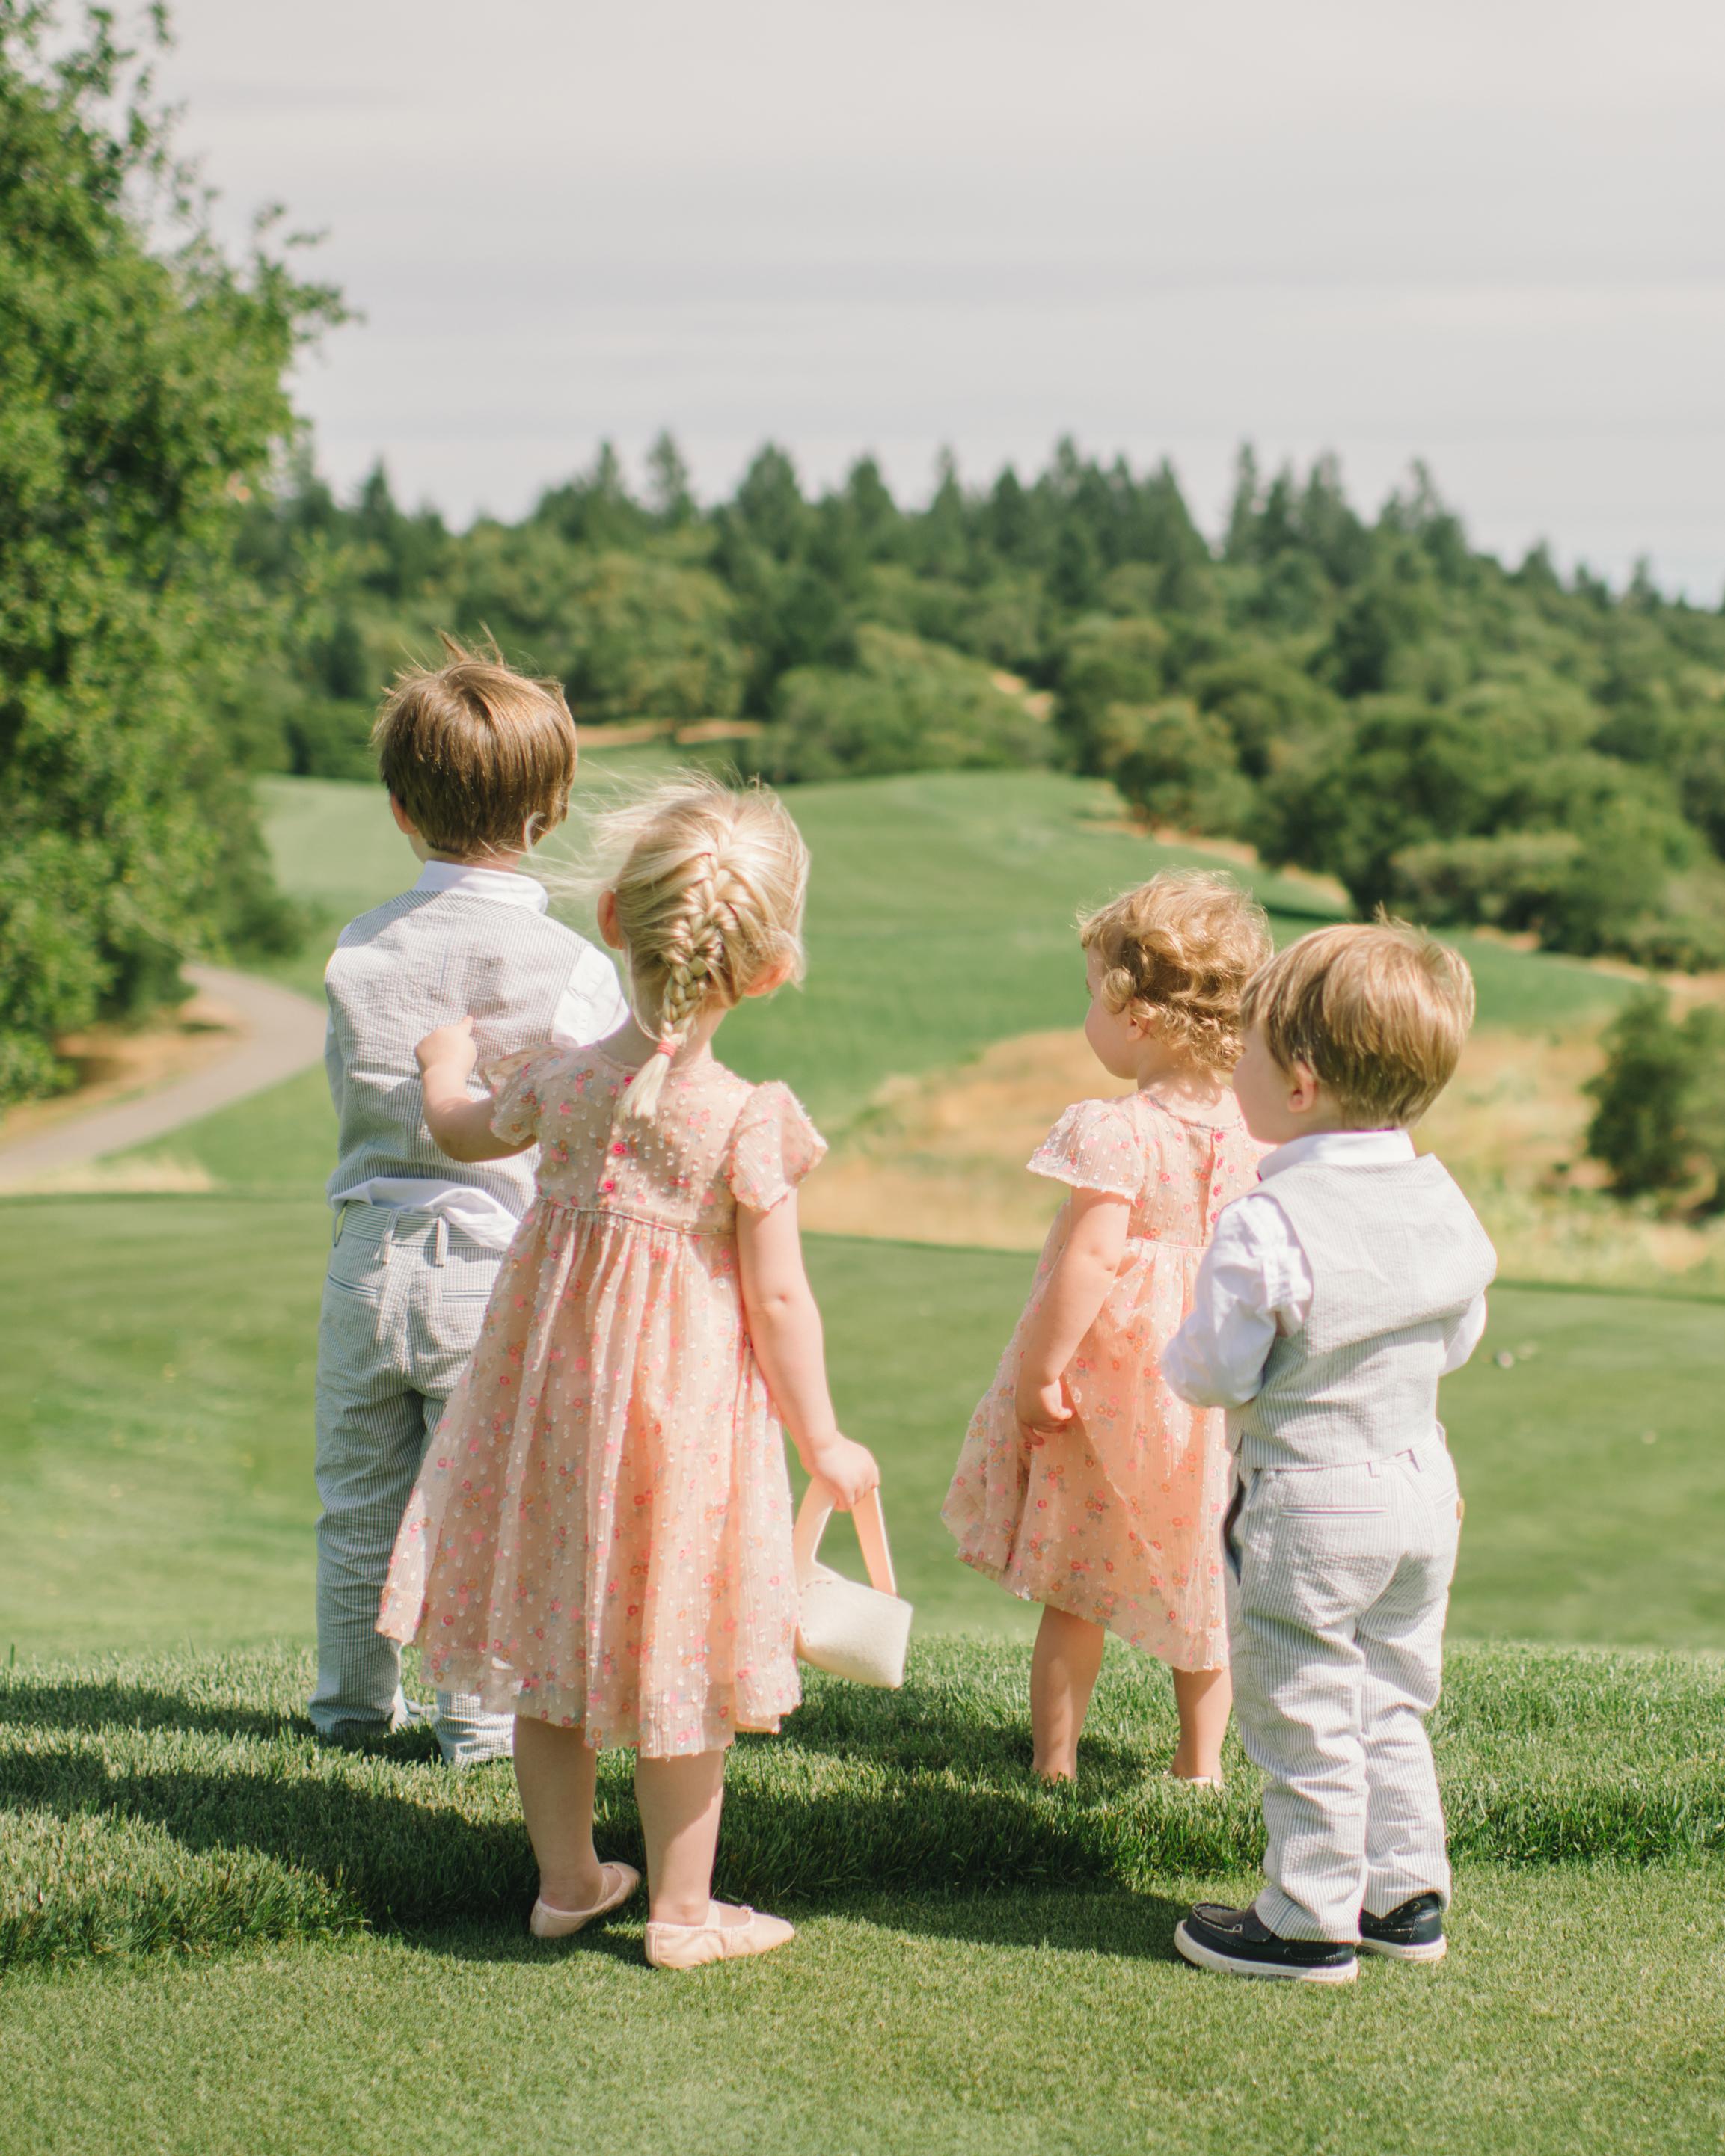 hanna-stephen-wedding-kids-0624-s111737-0115.jpg